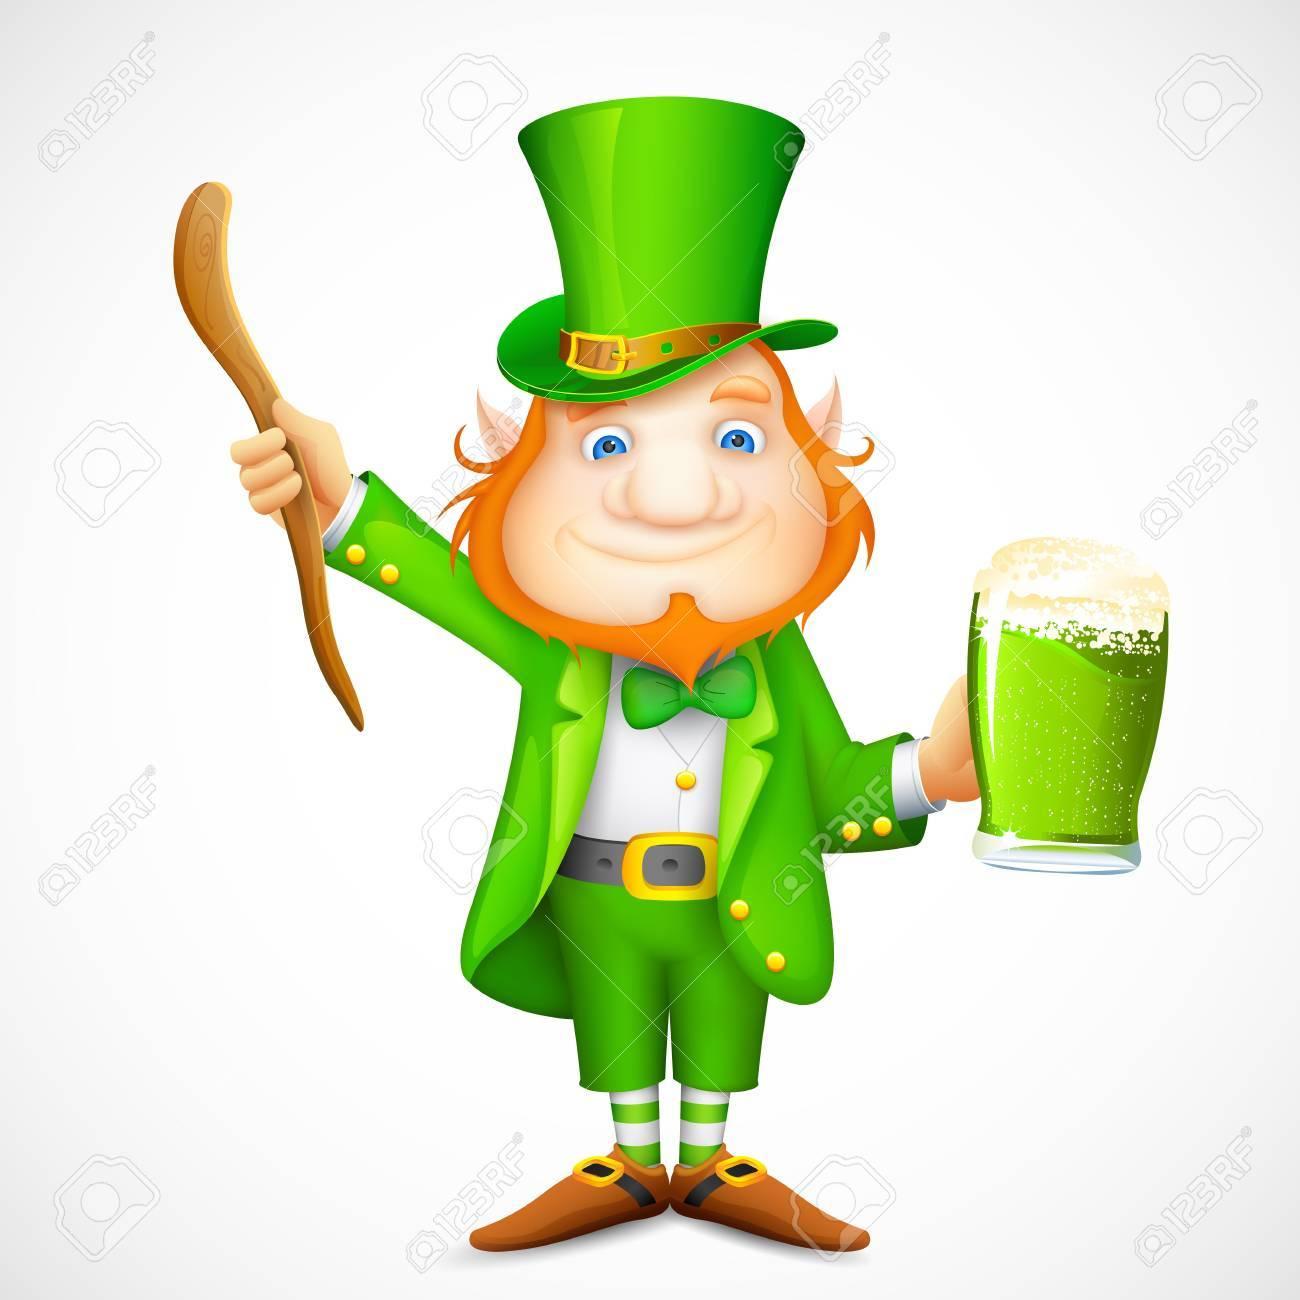 illustration of Leprechaun with beer mug wishing saint patrick s day Stock Vector - 18089741